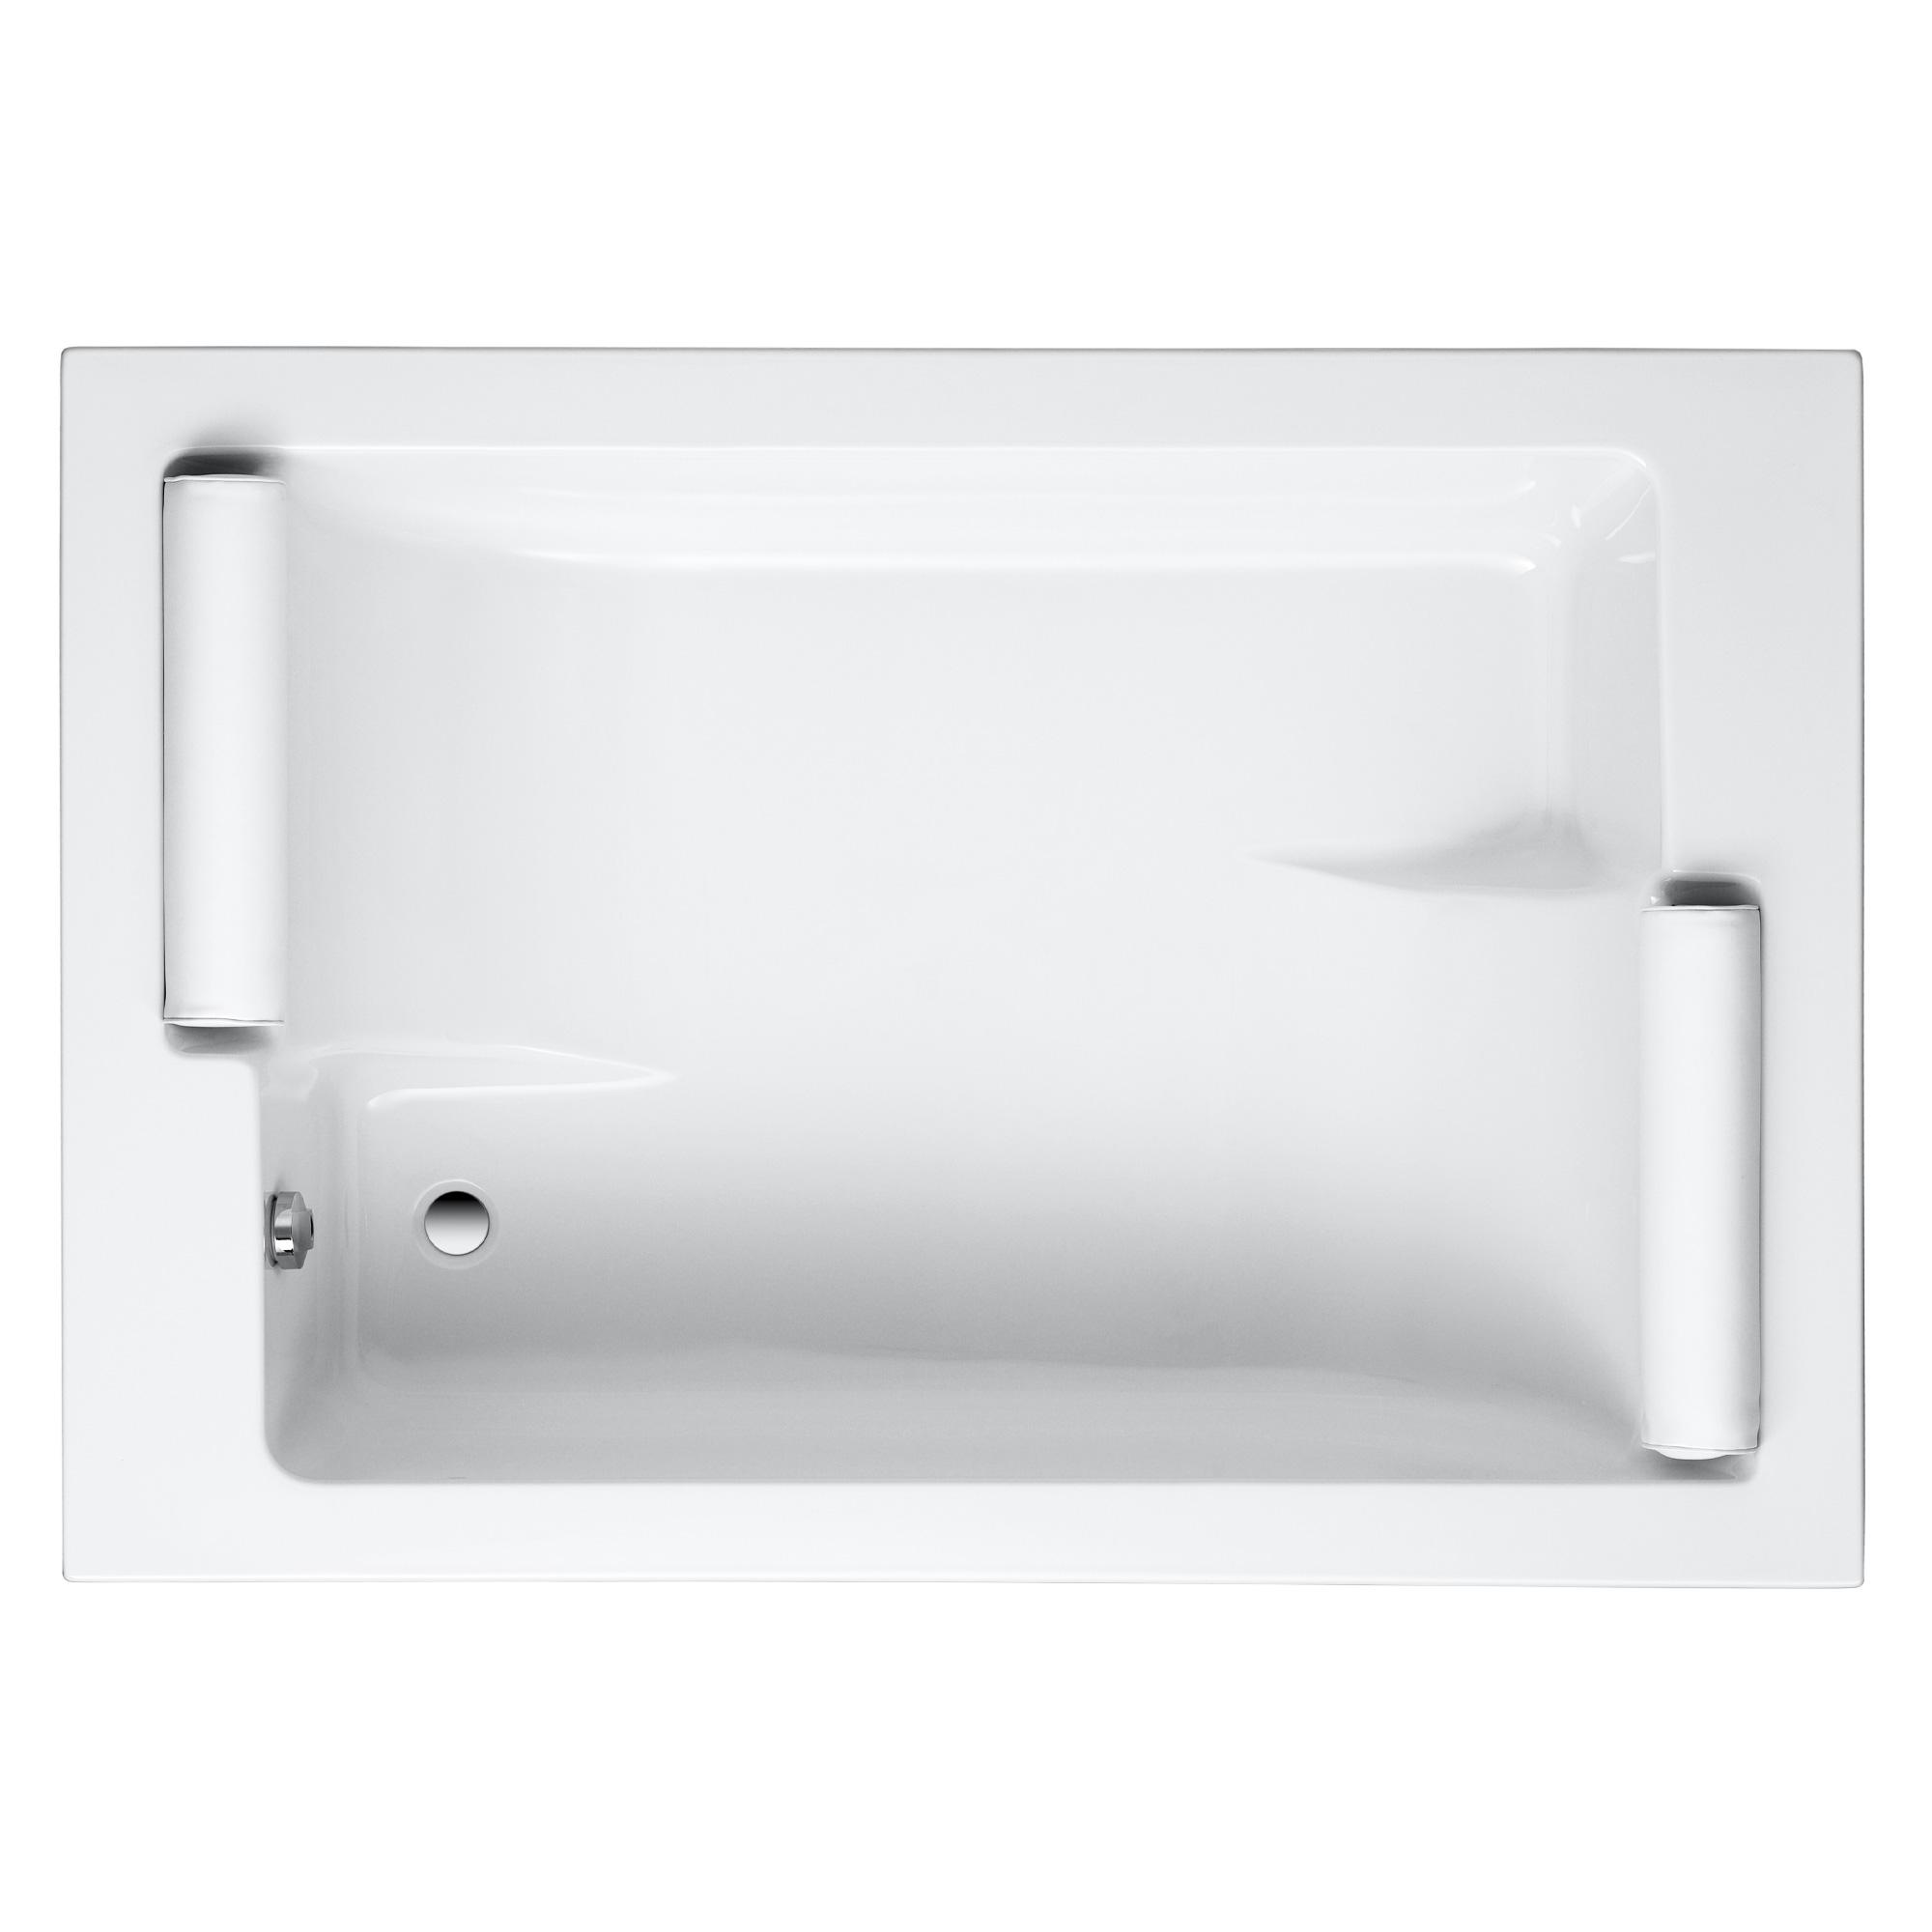 ottofond maharaja rechteck badewanne wei f r 2 personen mit wannentr ger 922001 w reuter. Black Bedroom Furniture Sets. Home Design Ideas